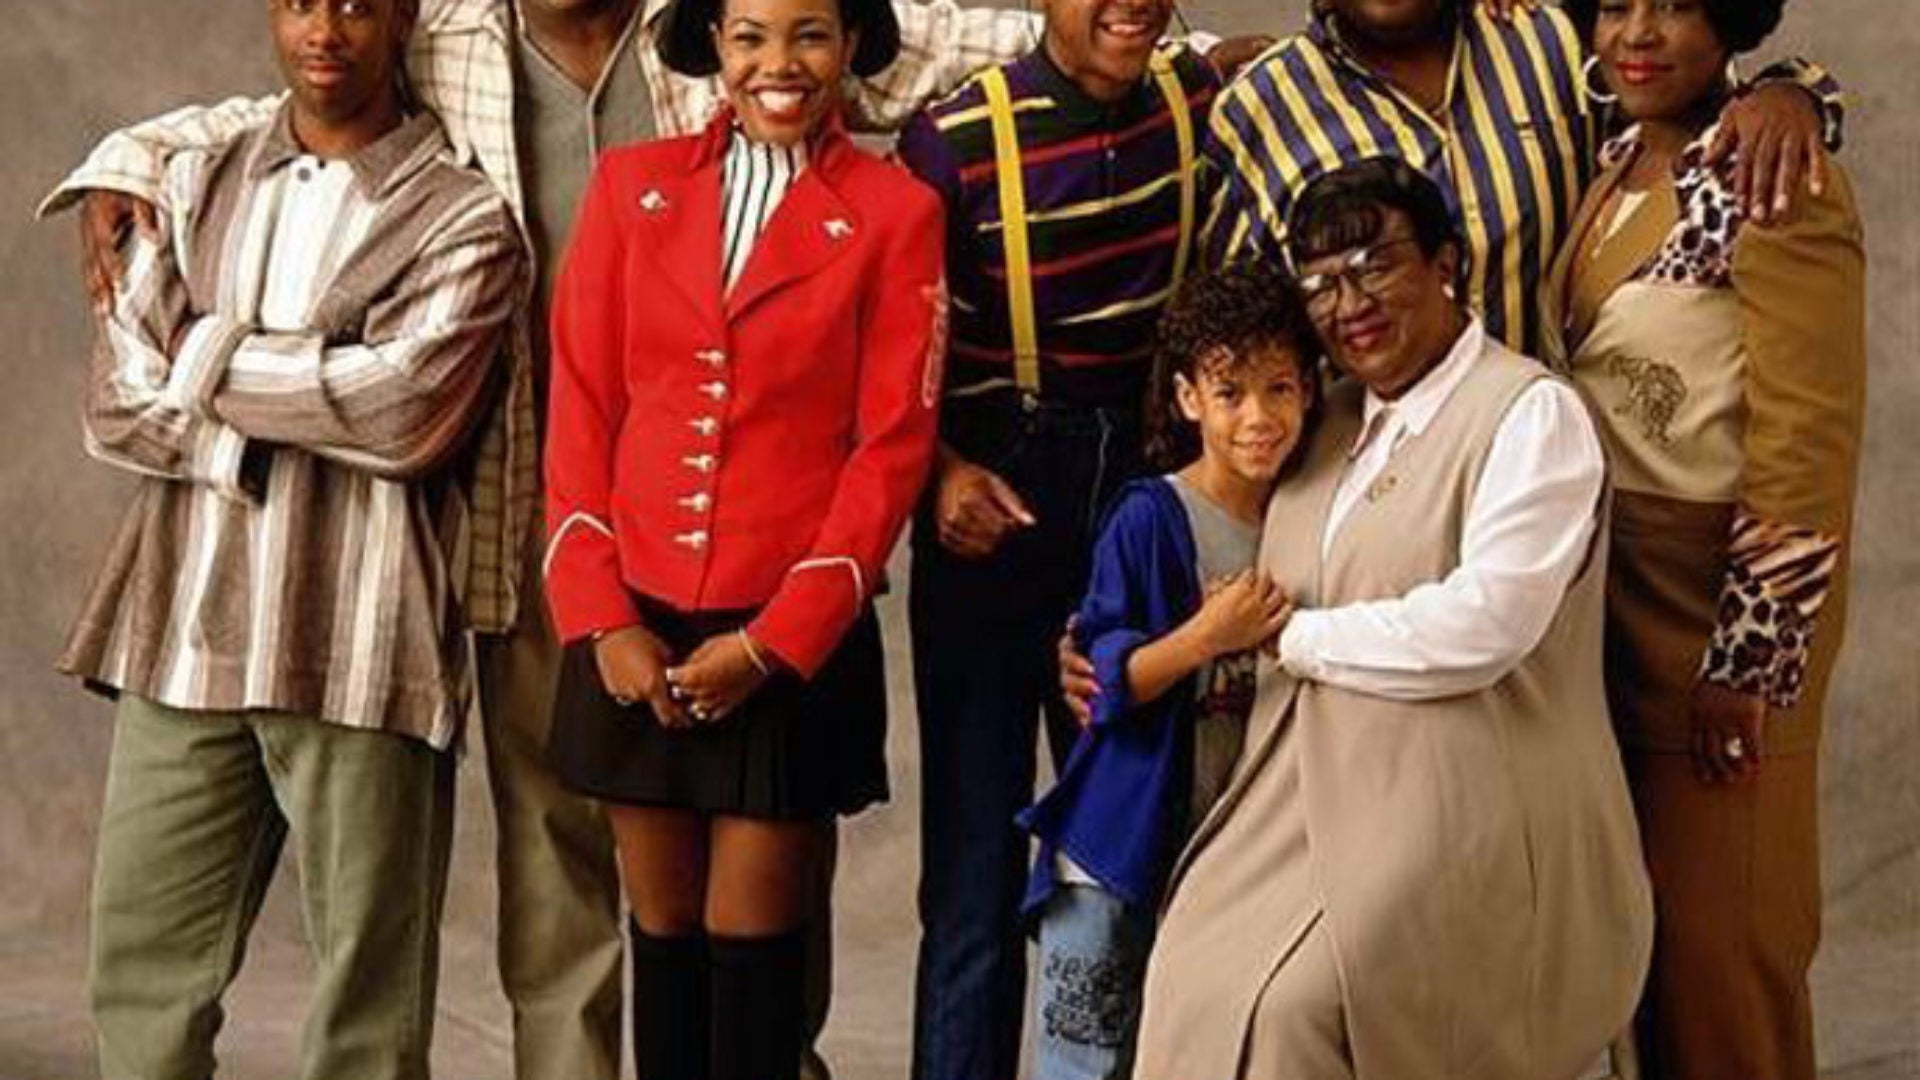 Family Matters: Exclusive Cast Reunion